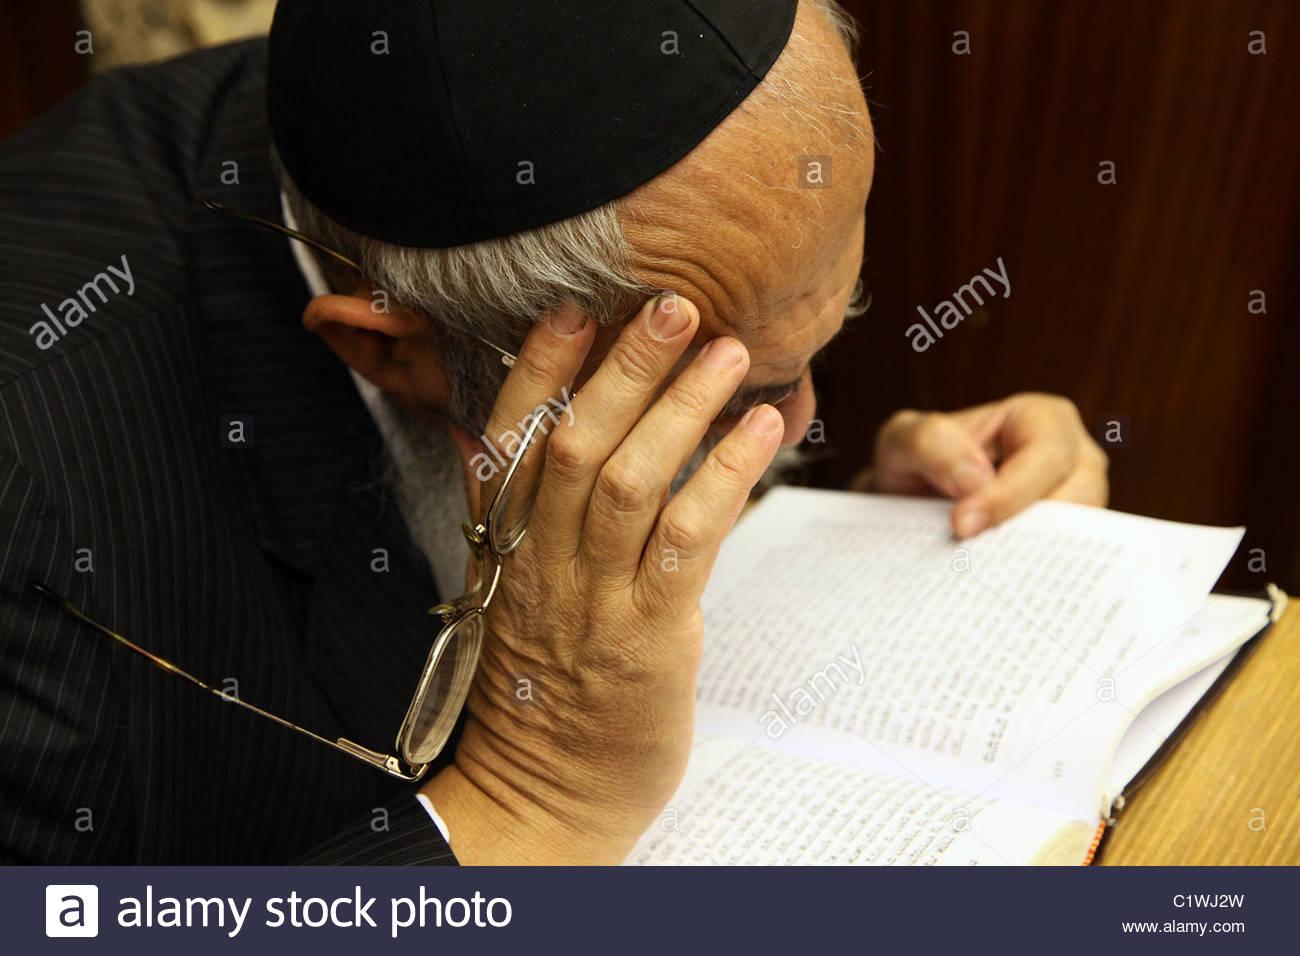 Orthodox Jewish reading the Siddur Jewish book of pray in Israel - Stock Image